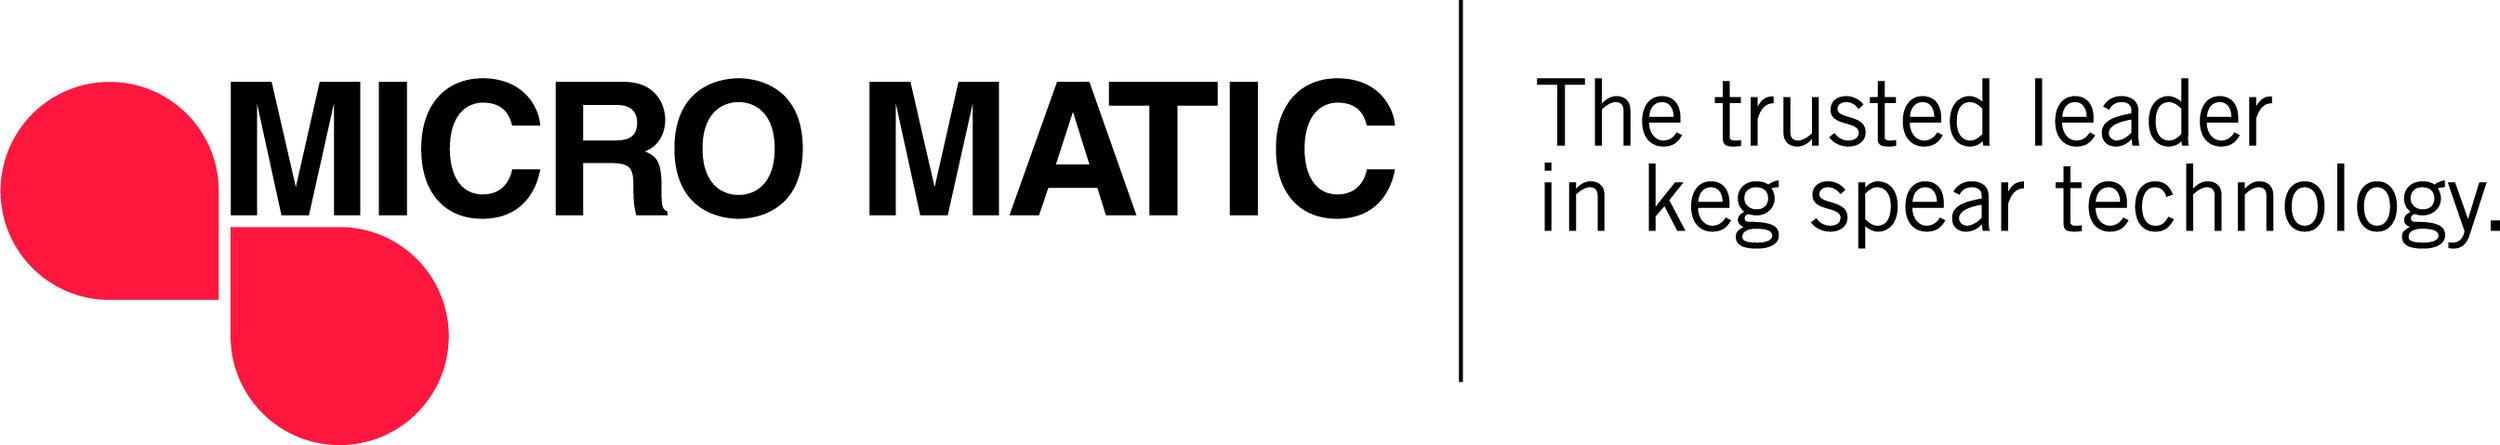 MicroMaticLogo_Tag.jpg